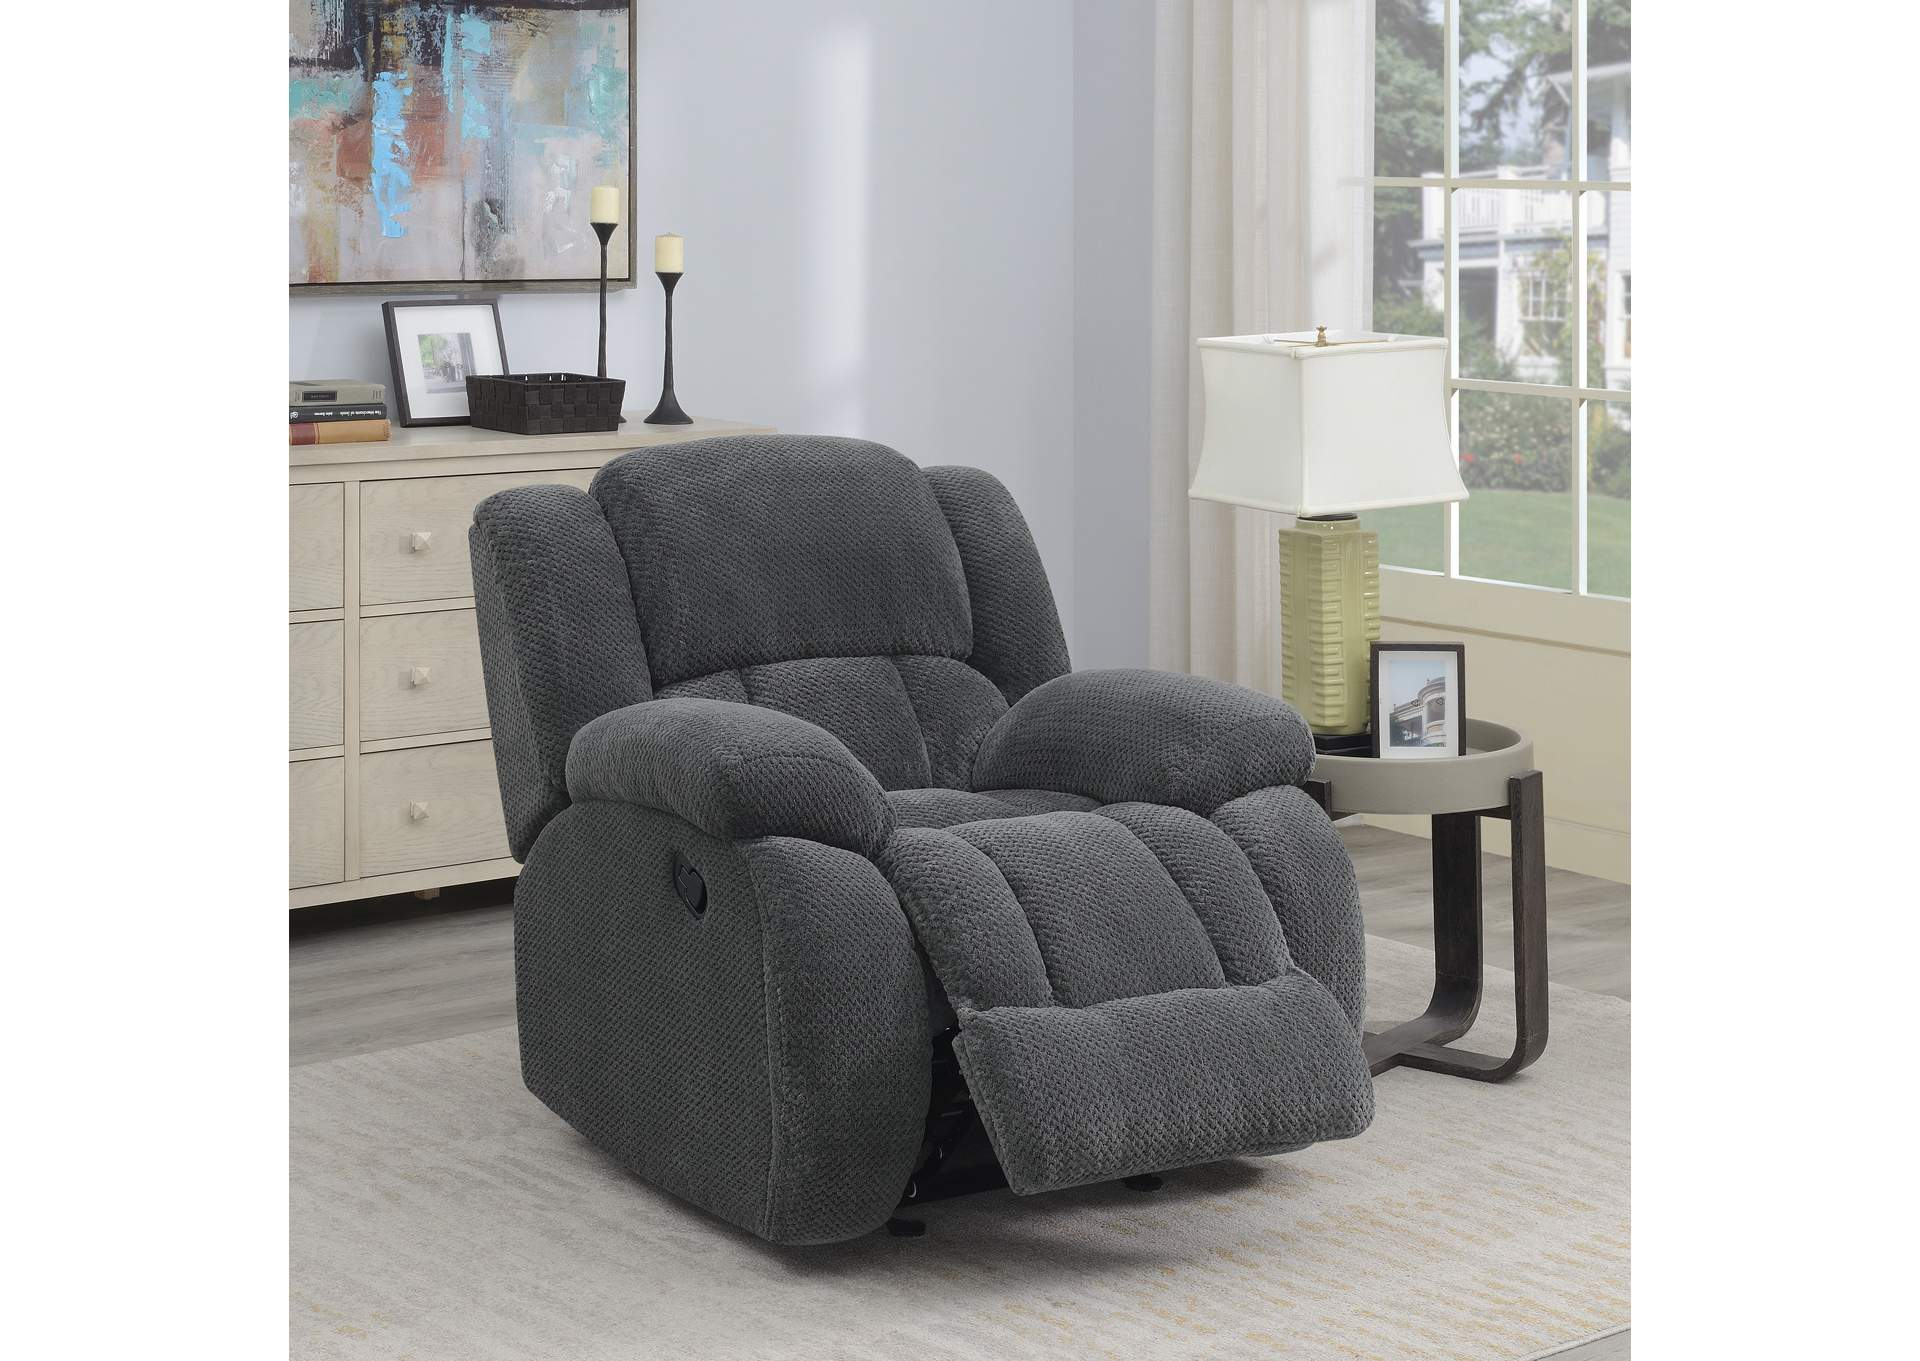 Enjoyable Fine Living Furniture Weissman Grey Glider Recliner Pdpeps Interior Chair Design Pdpepsorg